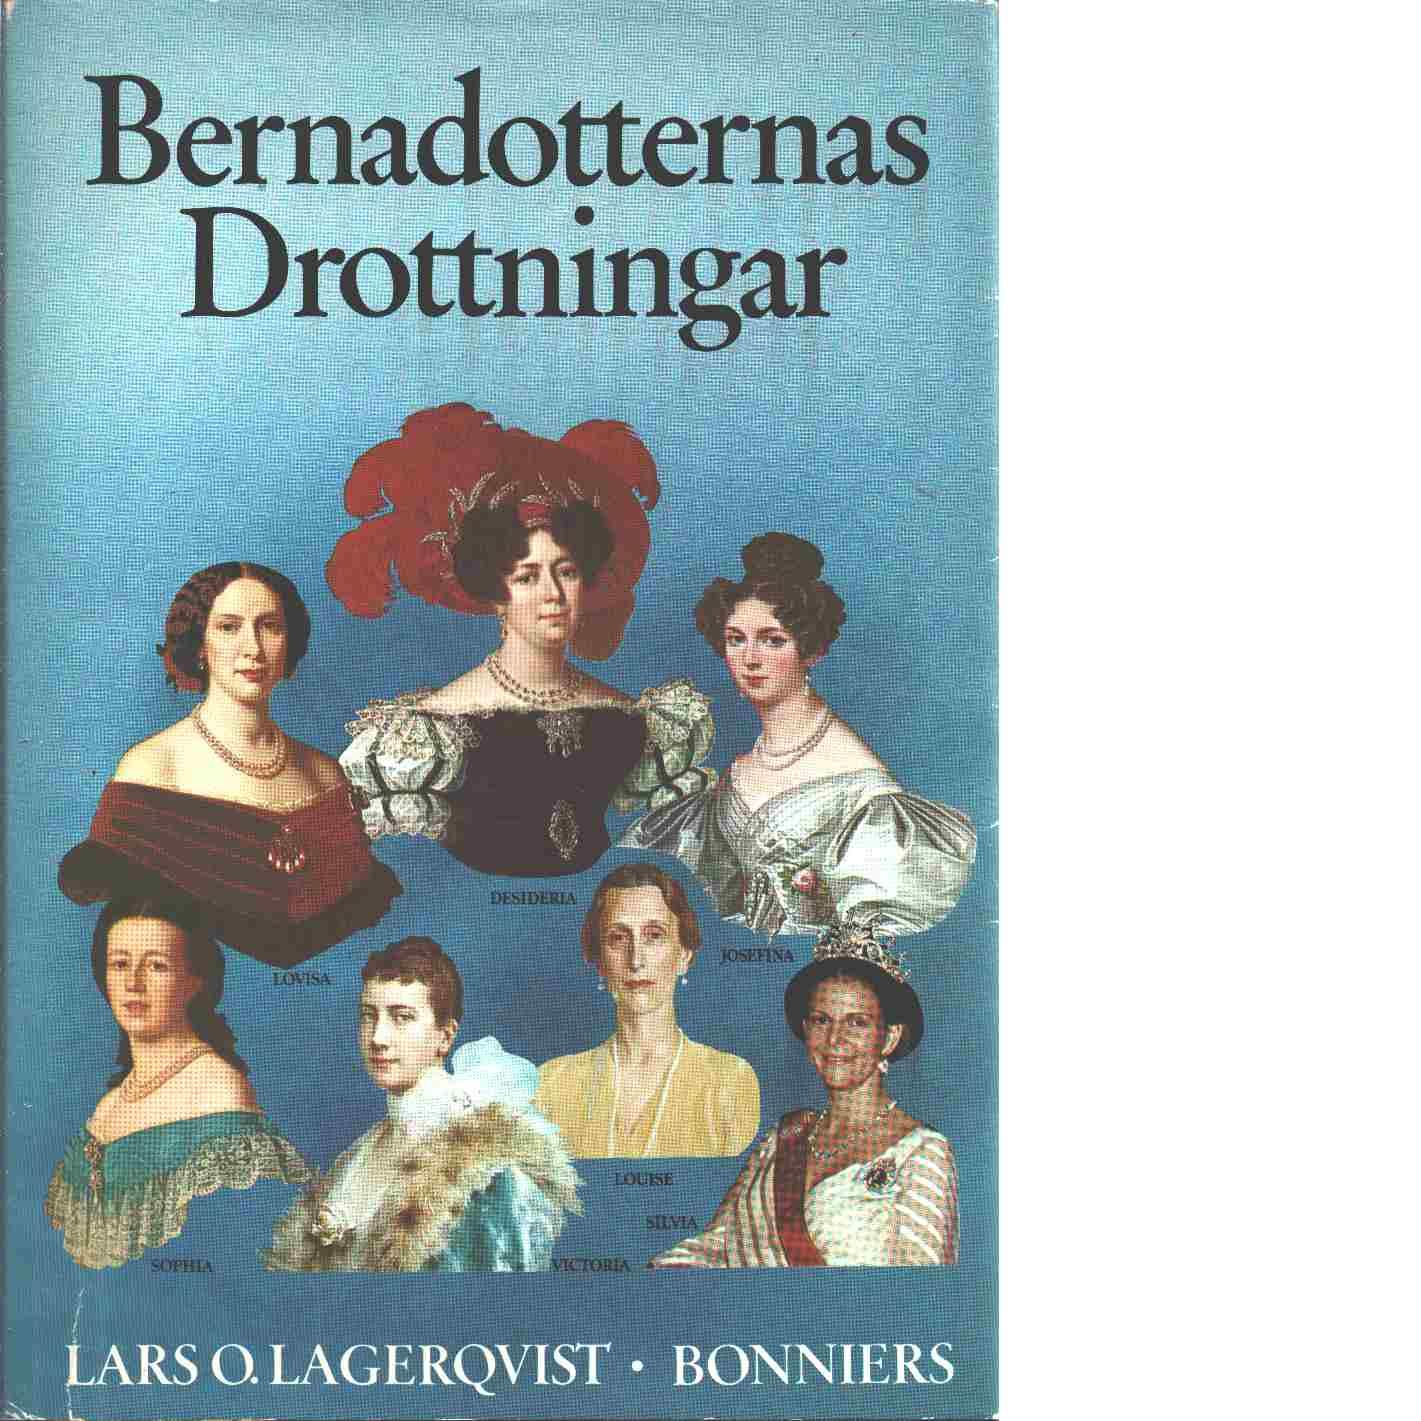 Bernadotternas drottningar - Lagerqvist, Lars O.